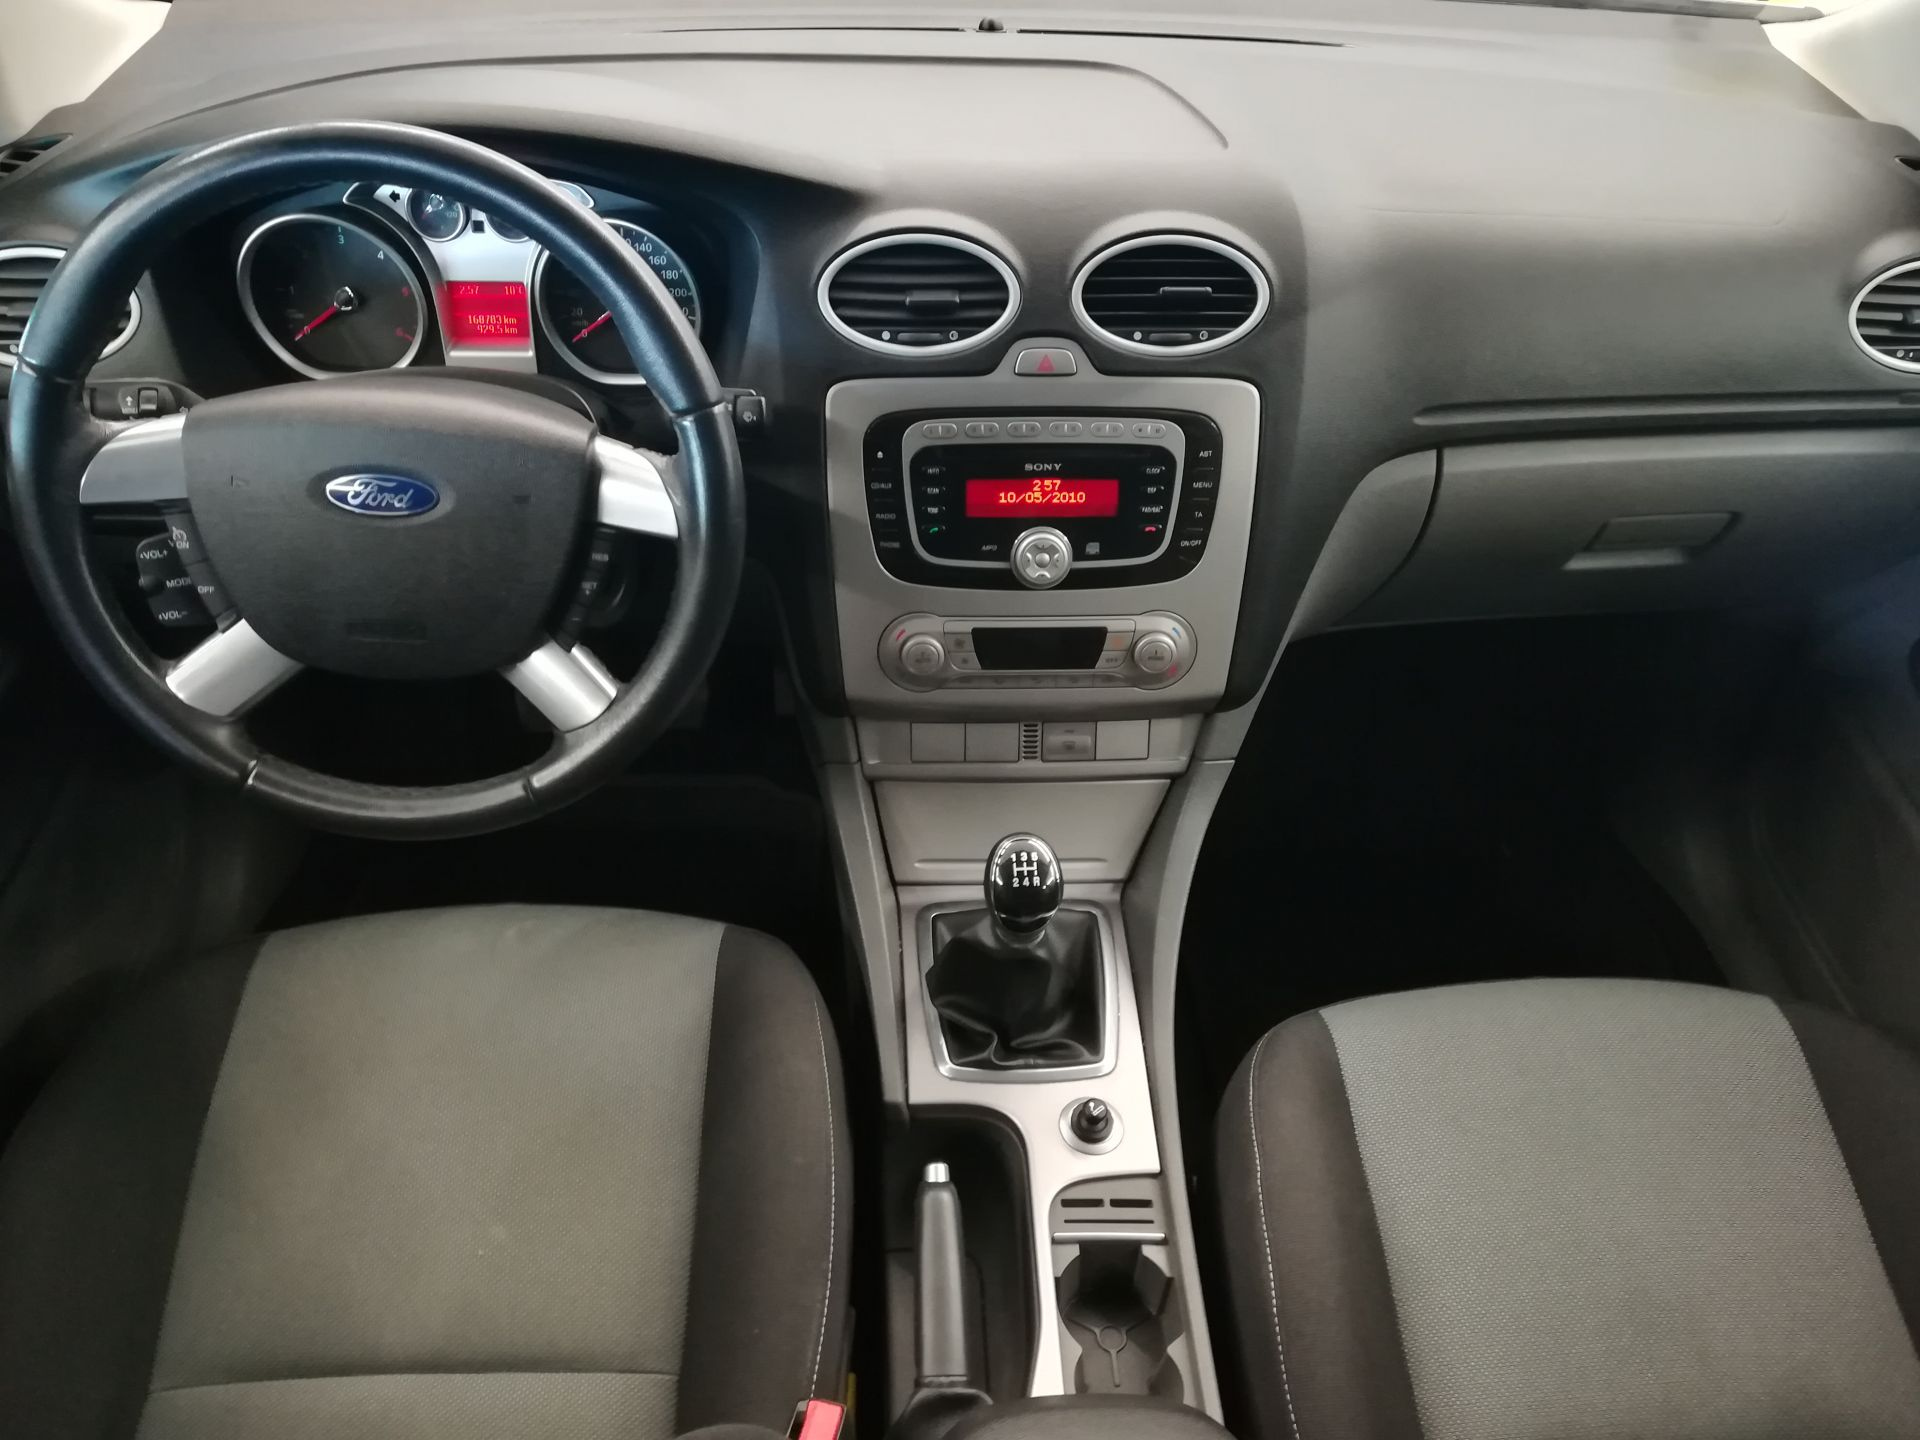 Ford Focus 1.6 TDCi 109 Trend